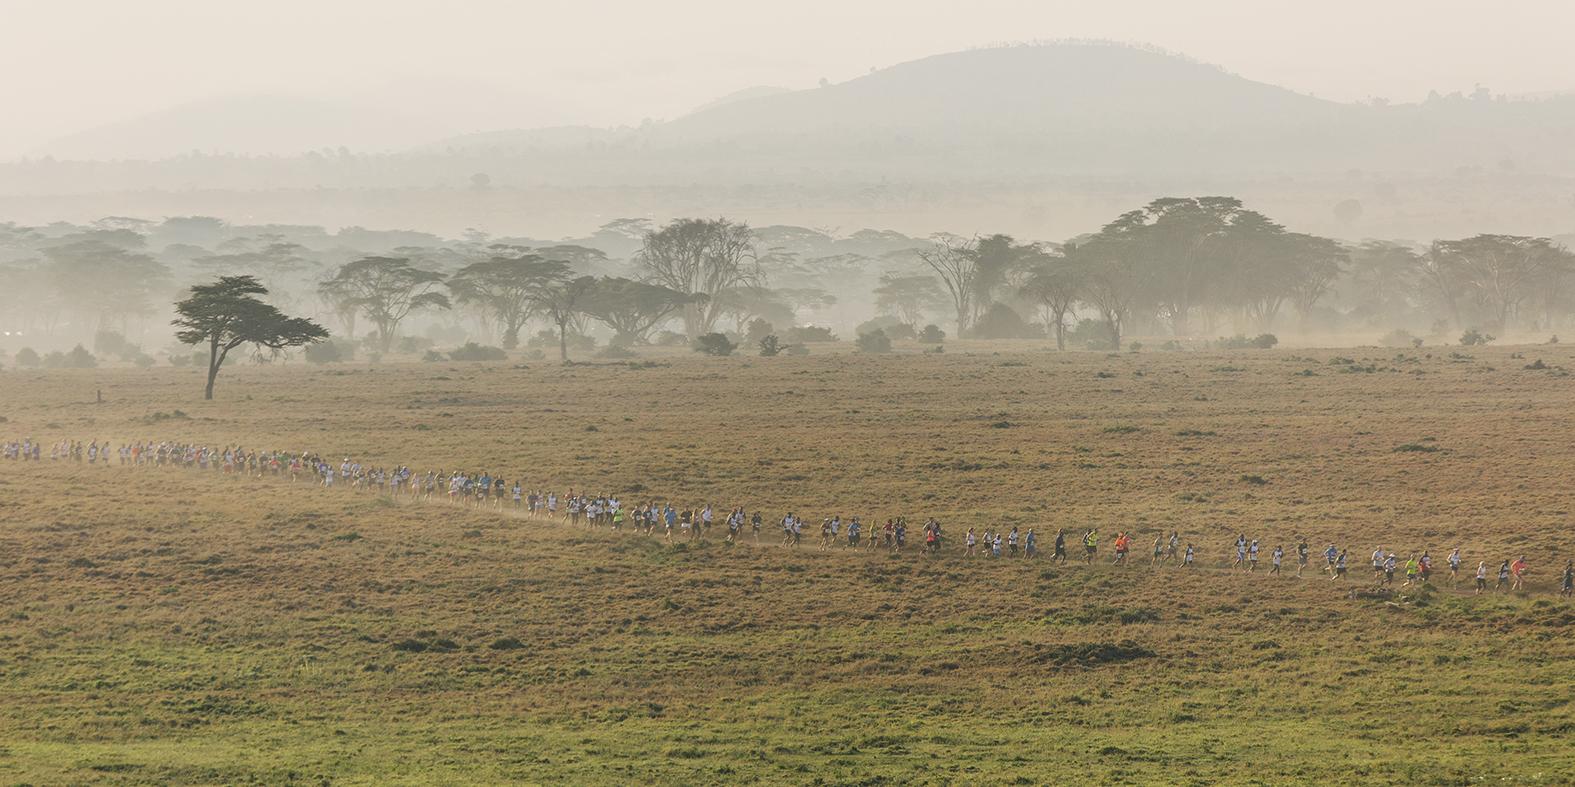 Safaricom Marathon, Lewa Wildlife Conservancy